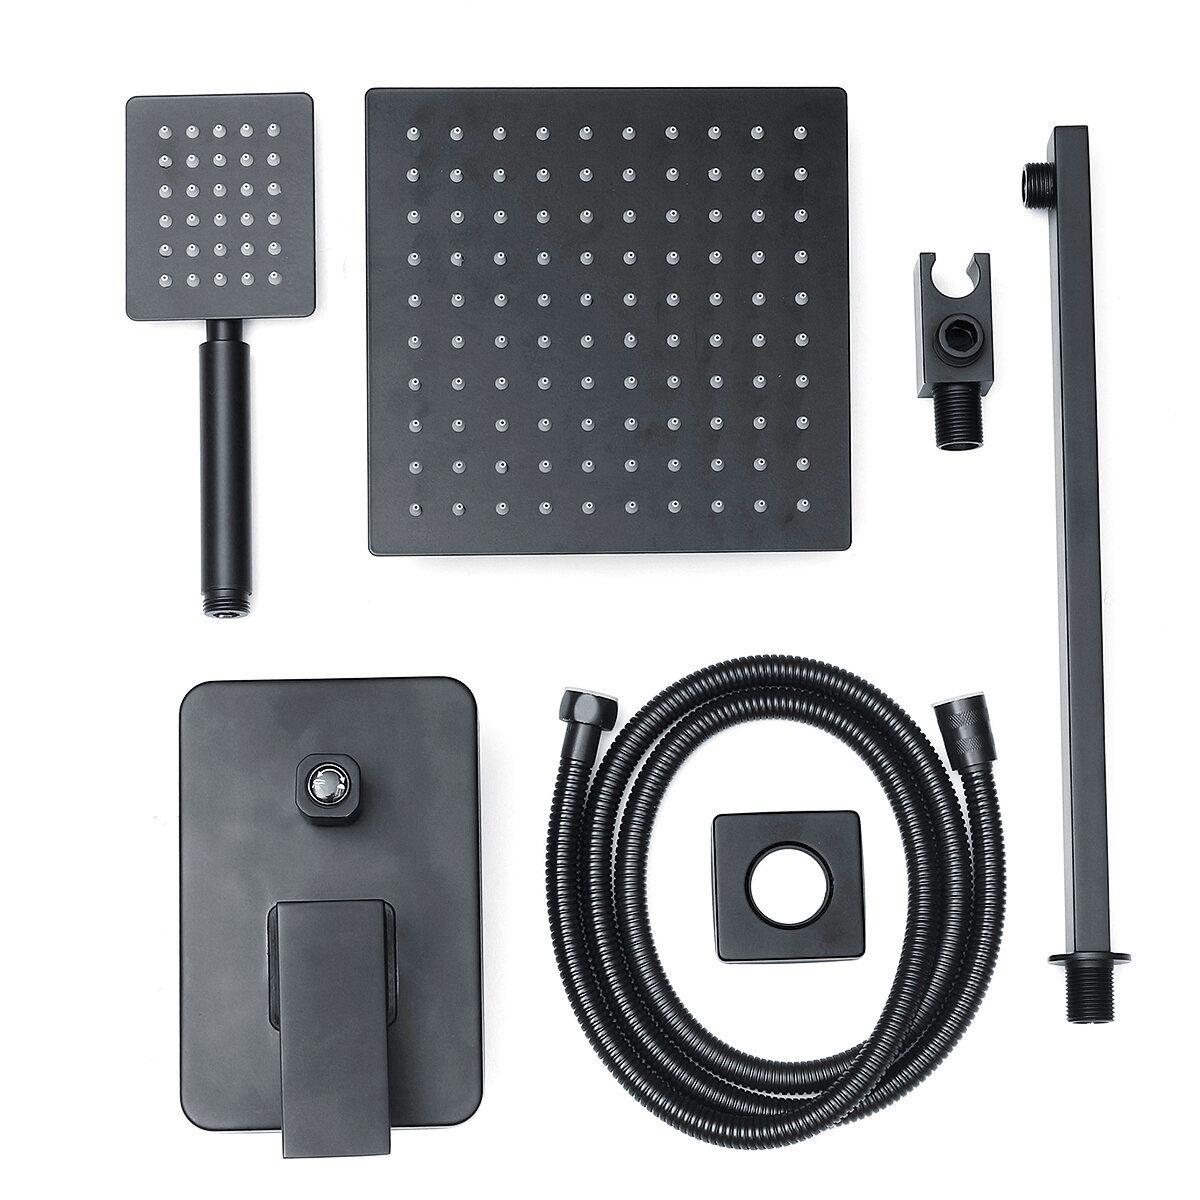 8''Black Wall Mounted Rainfall Shower Head Faucet Tub Spout Mixer Tap Shower Combo Set